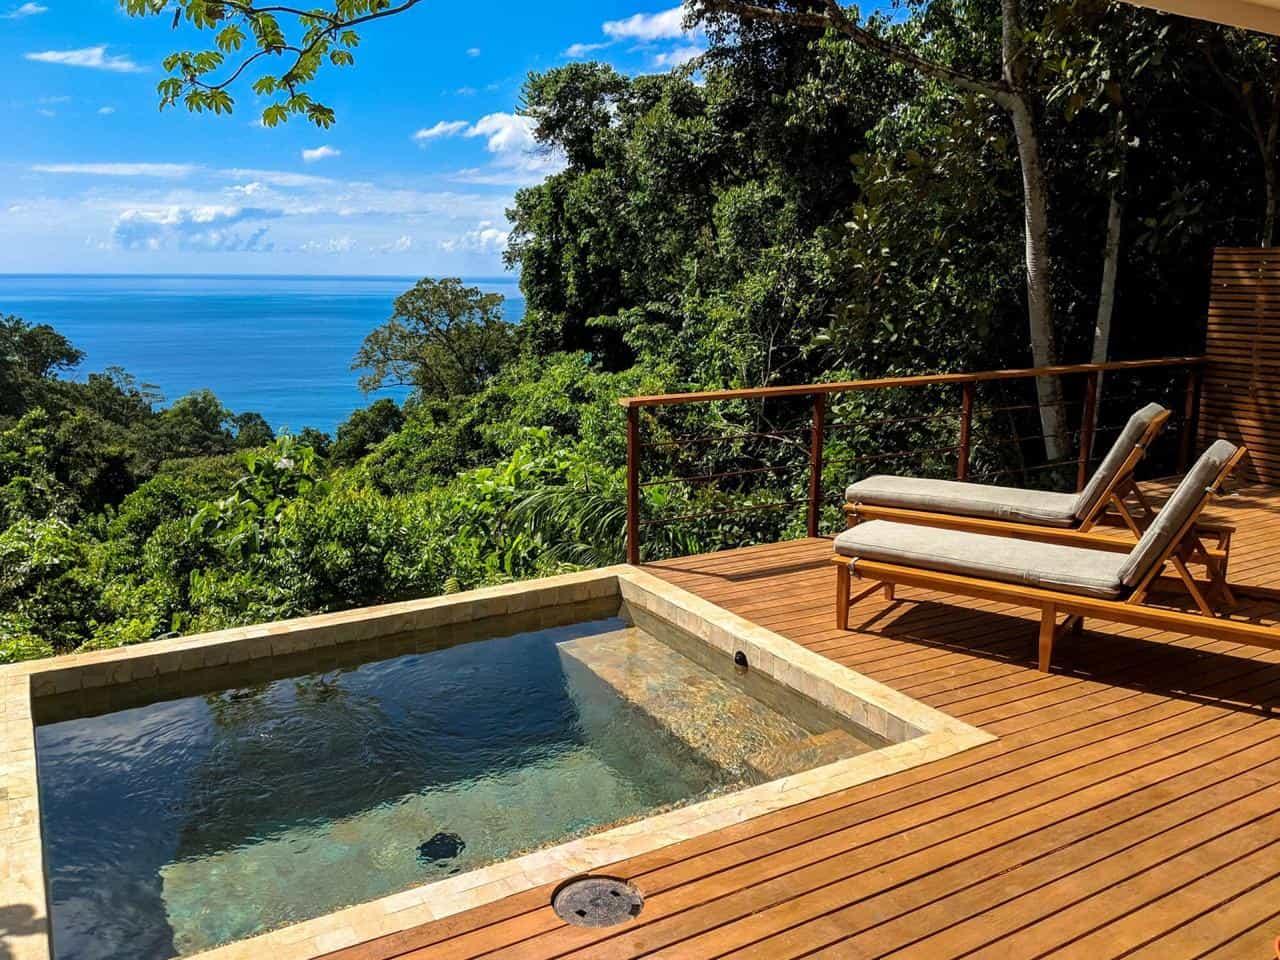 costa rica reizen plunge pool